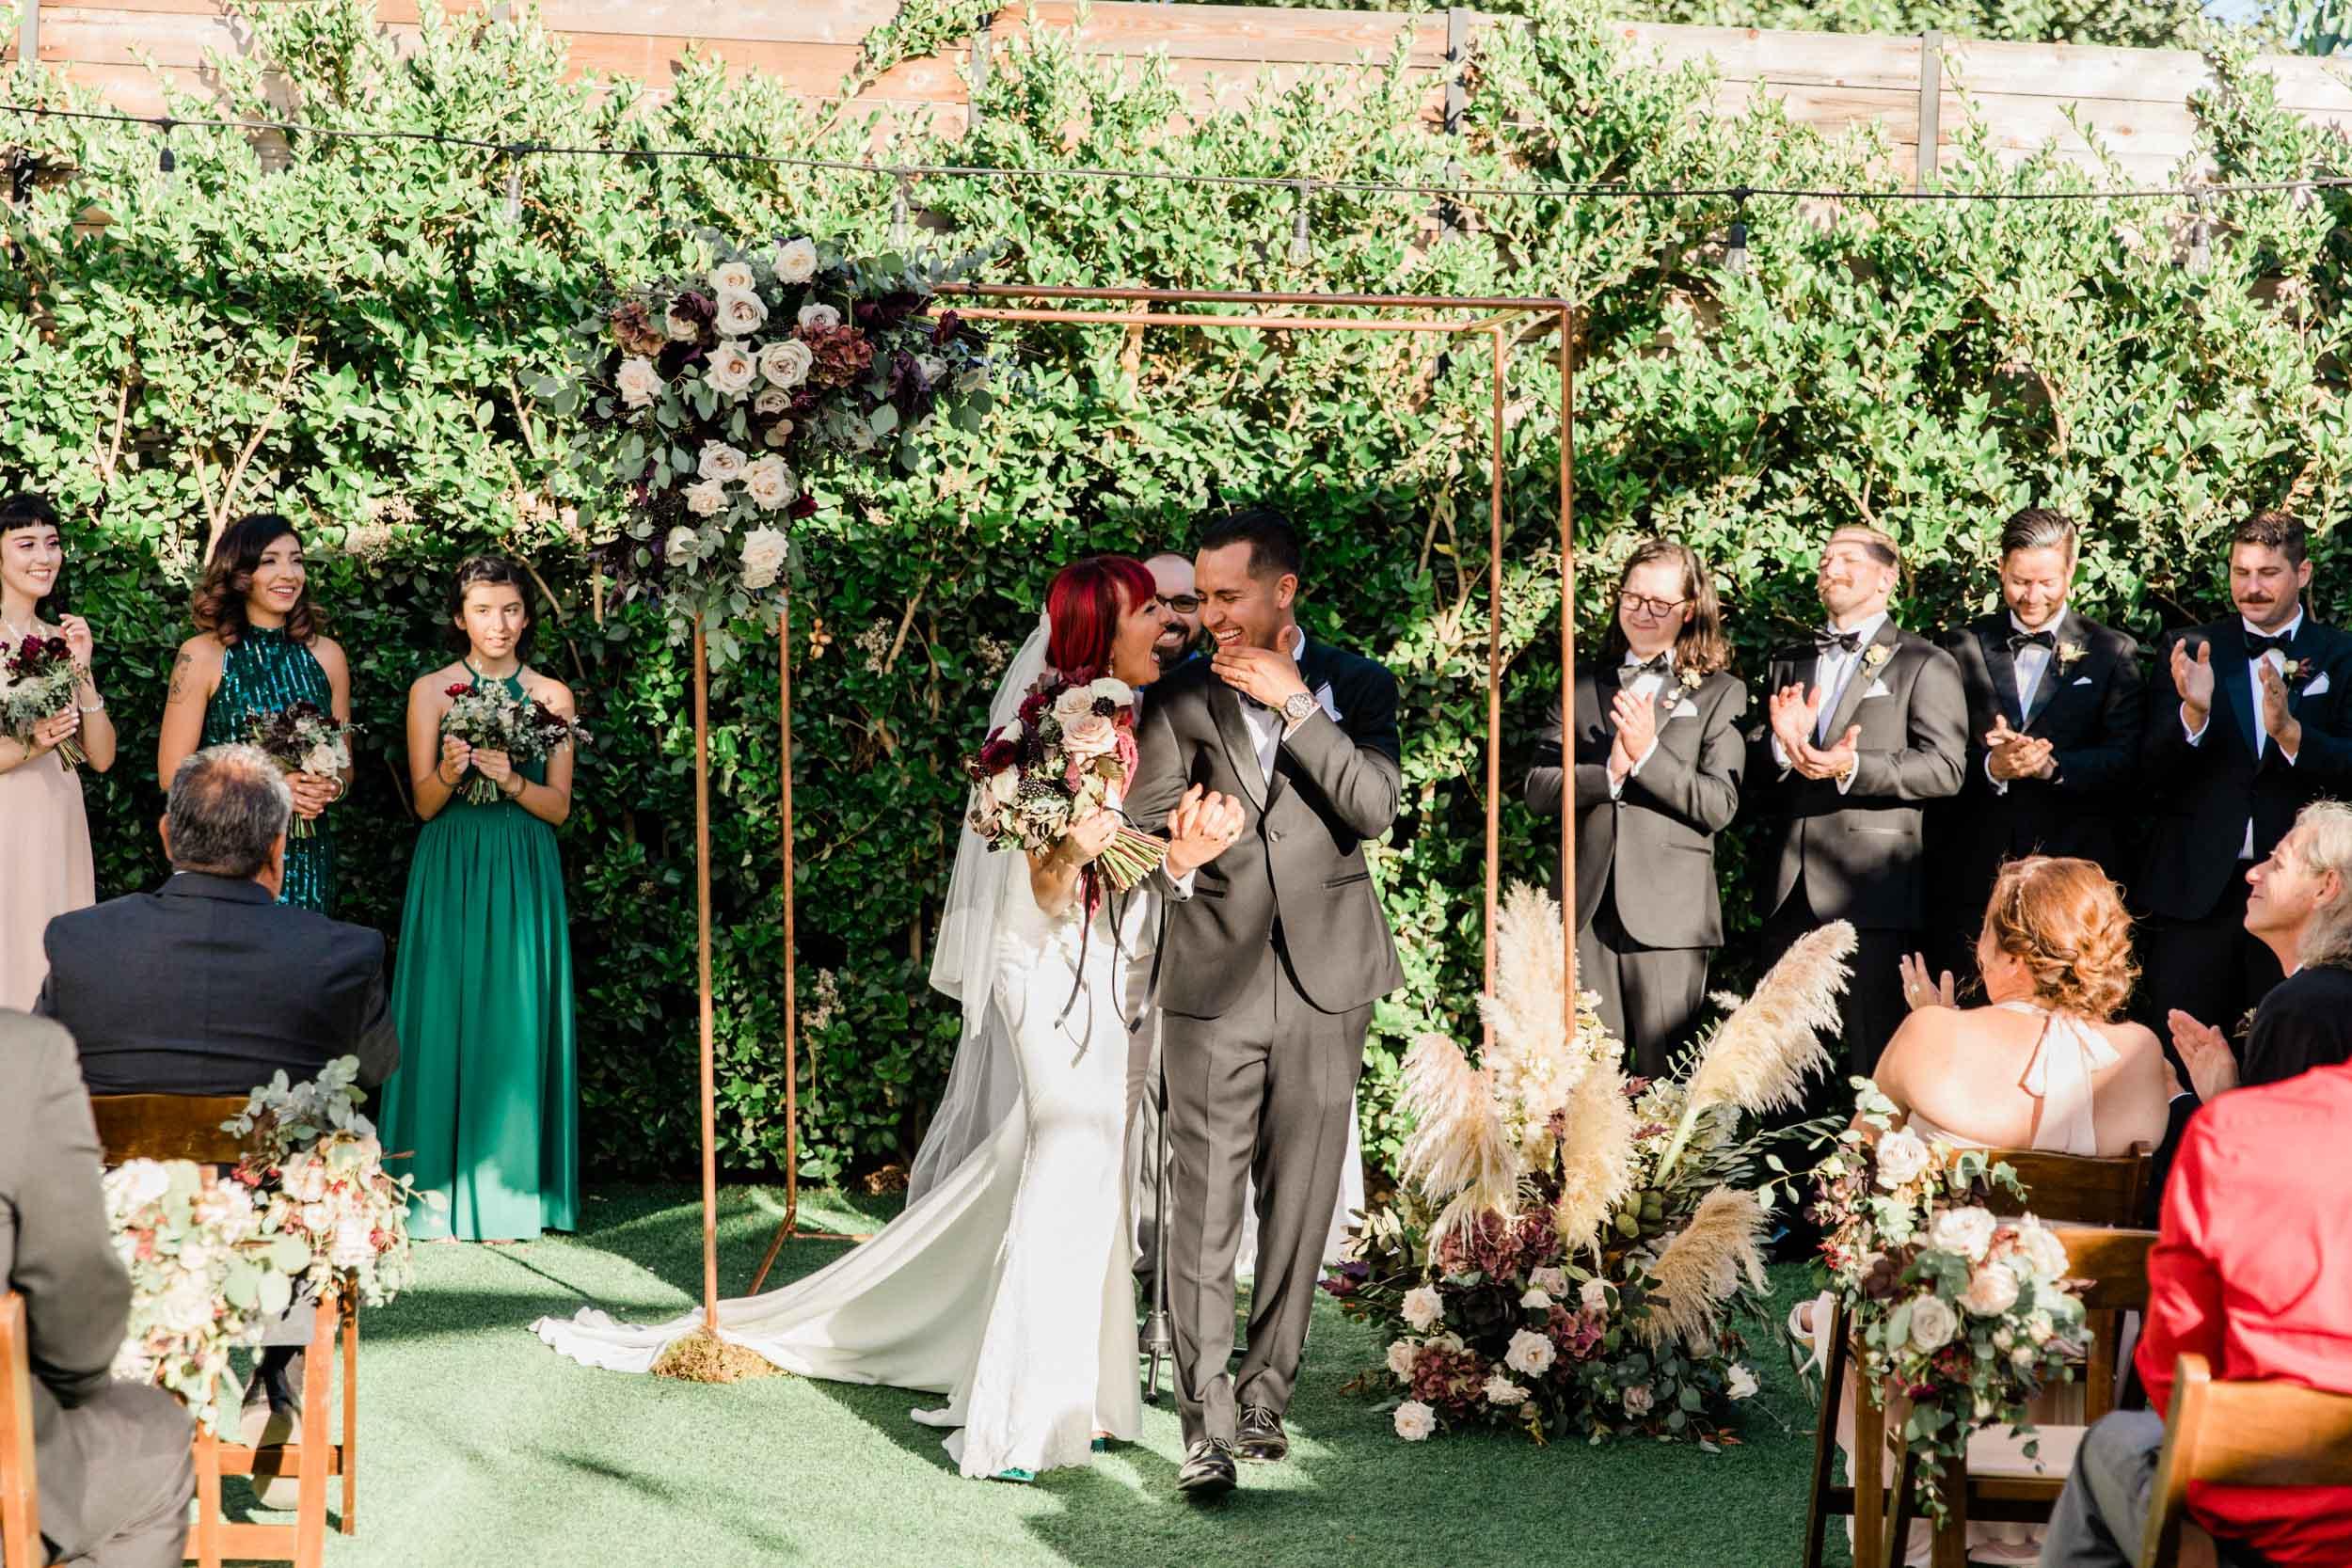 BKM-Photography-Los-Angeles-Highland-Park-York-Manor-Wedding-Photography-0728.jpg